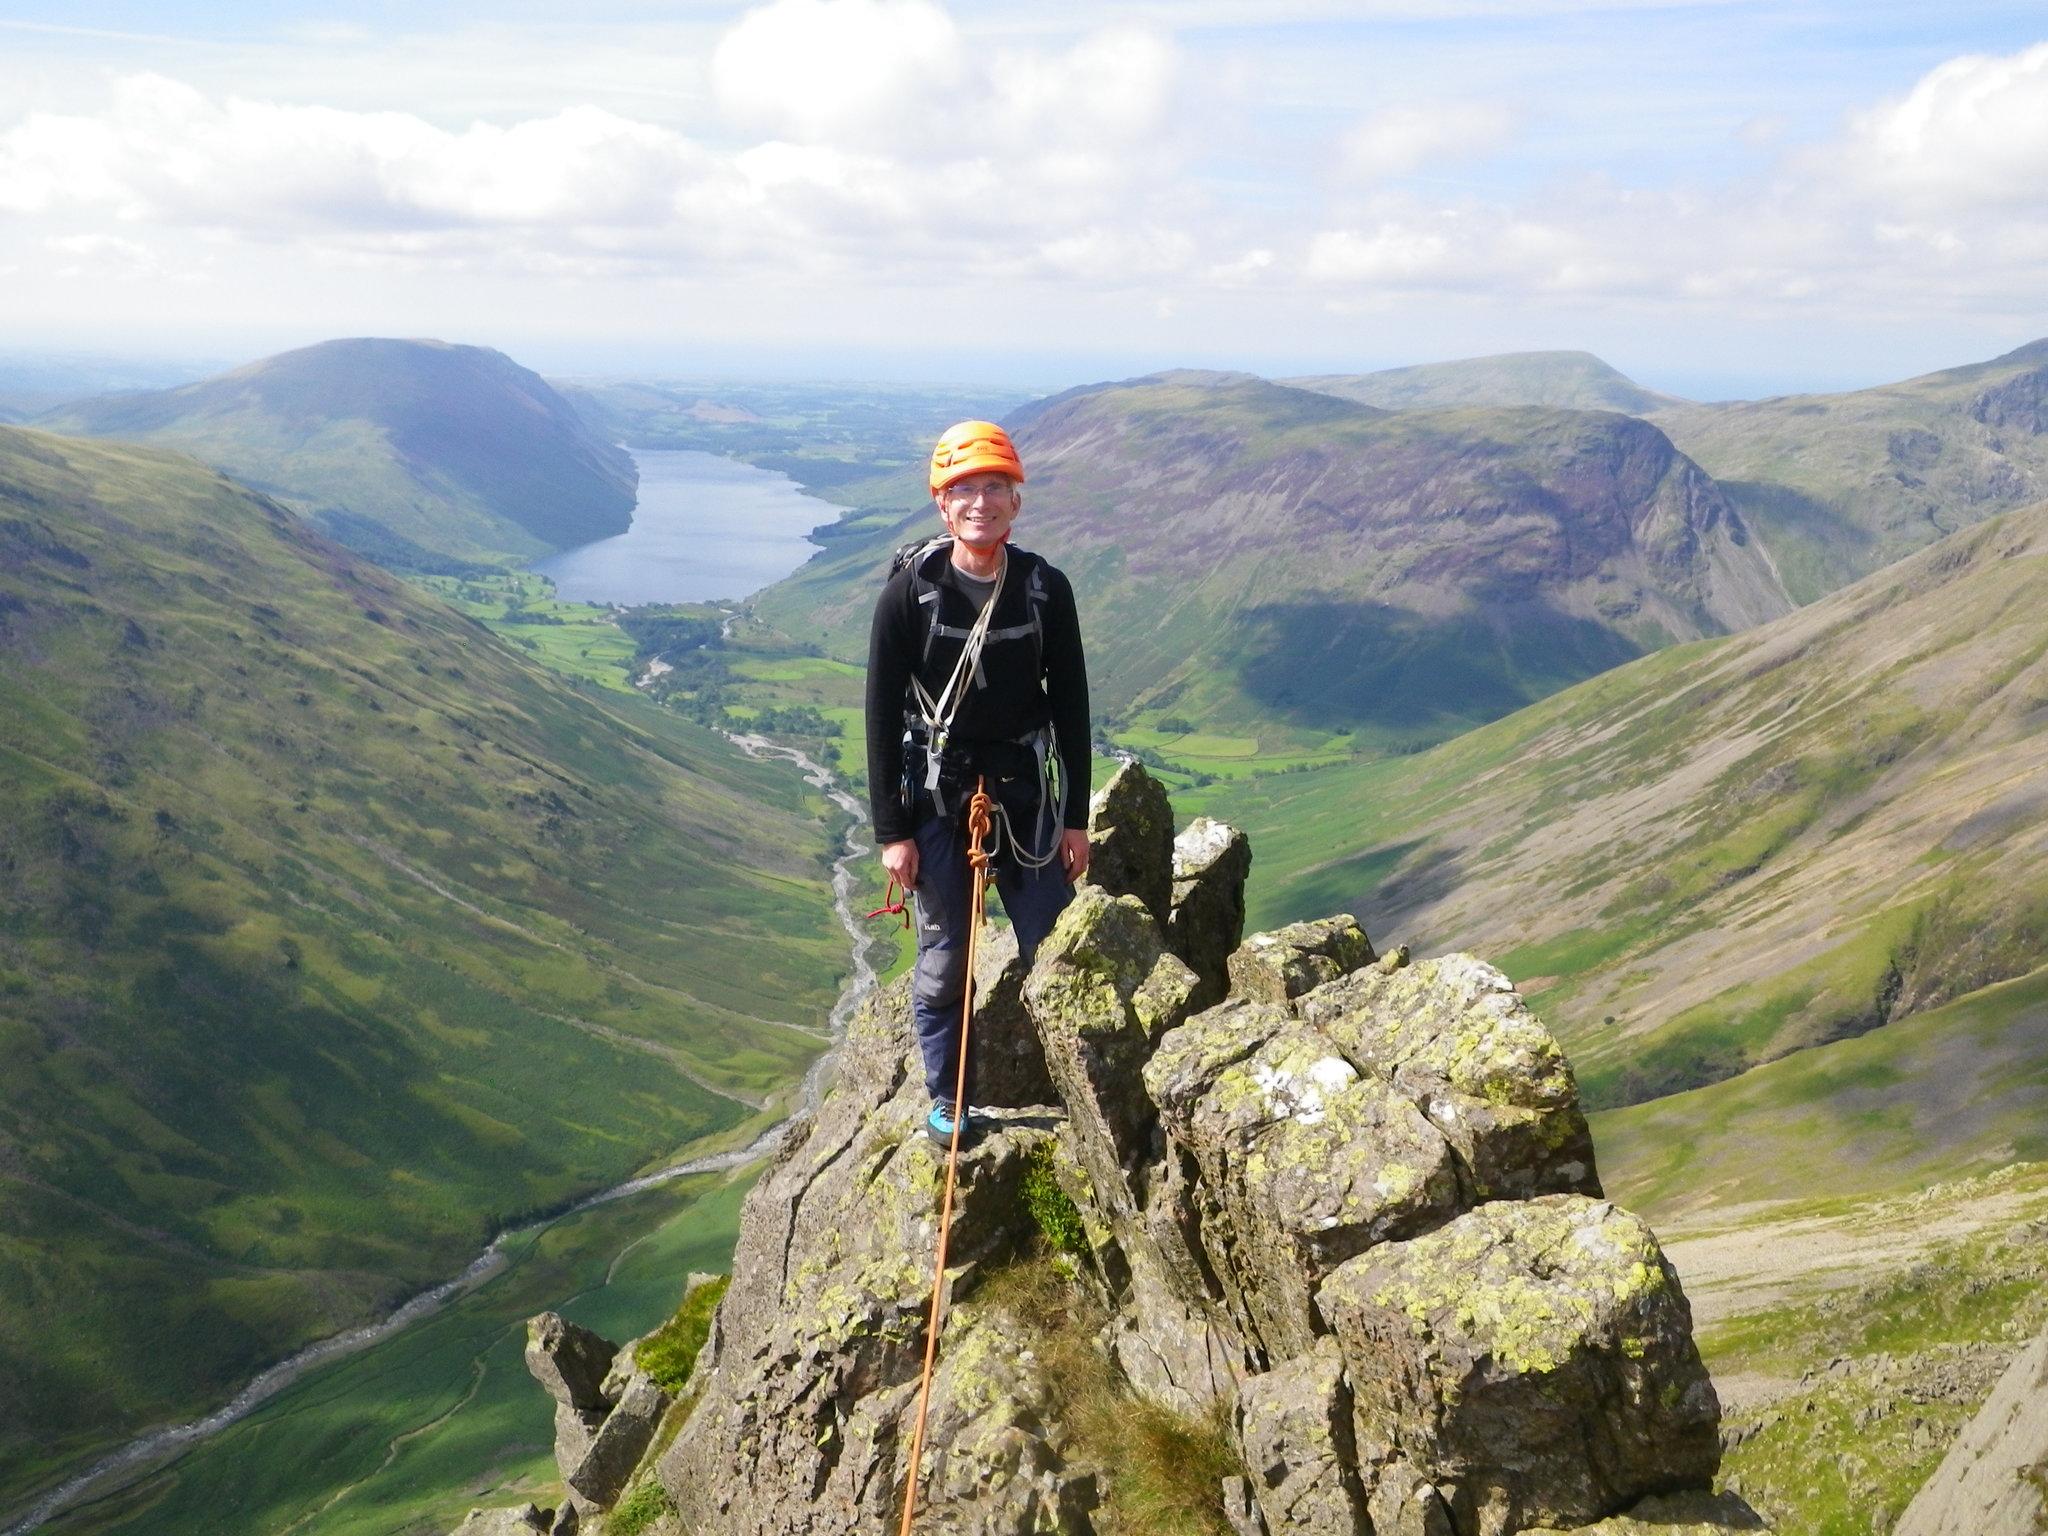 August: rock climbing on Needle Ridge in the Lake District